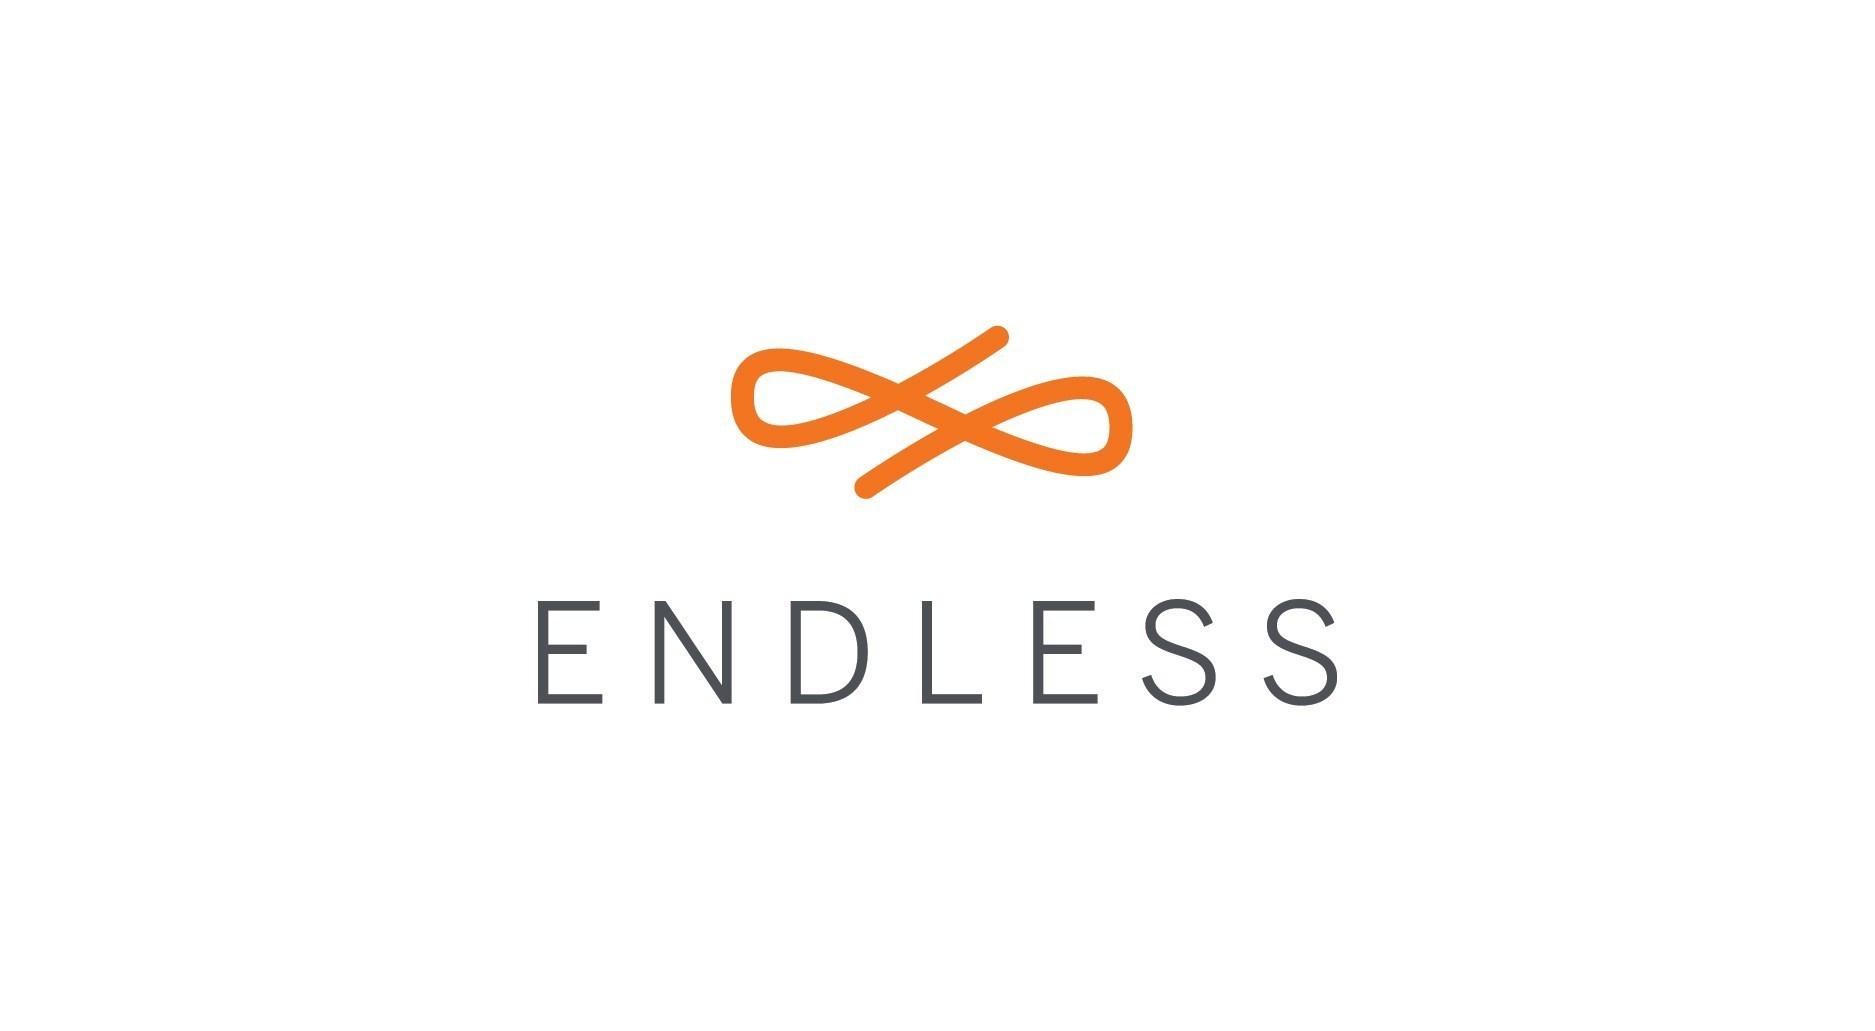 Endless logo